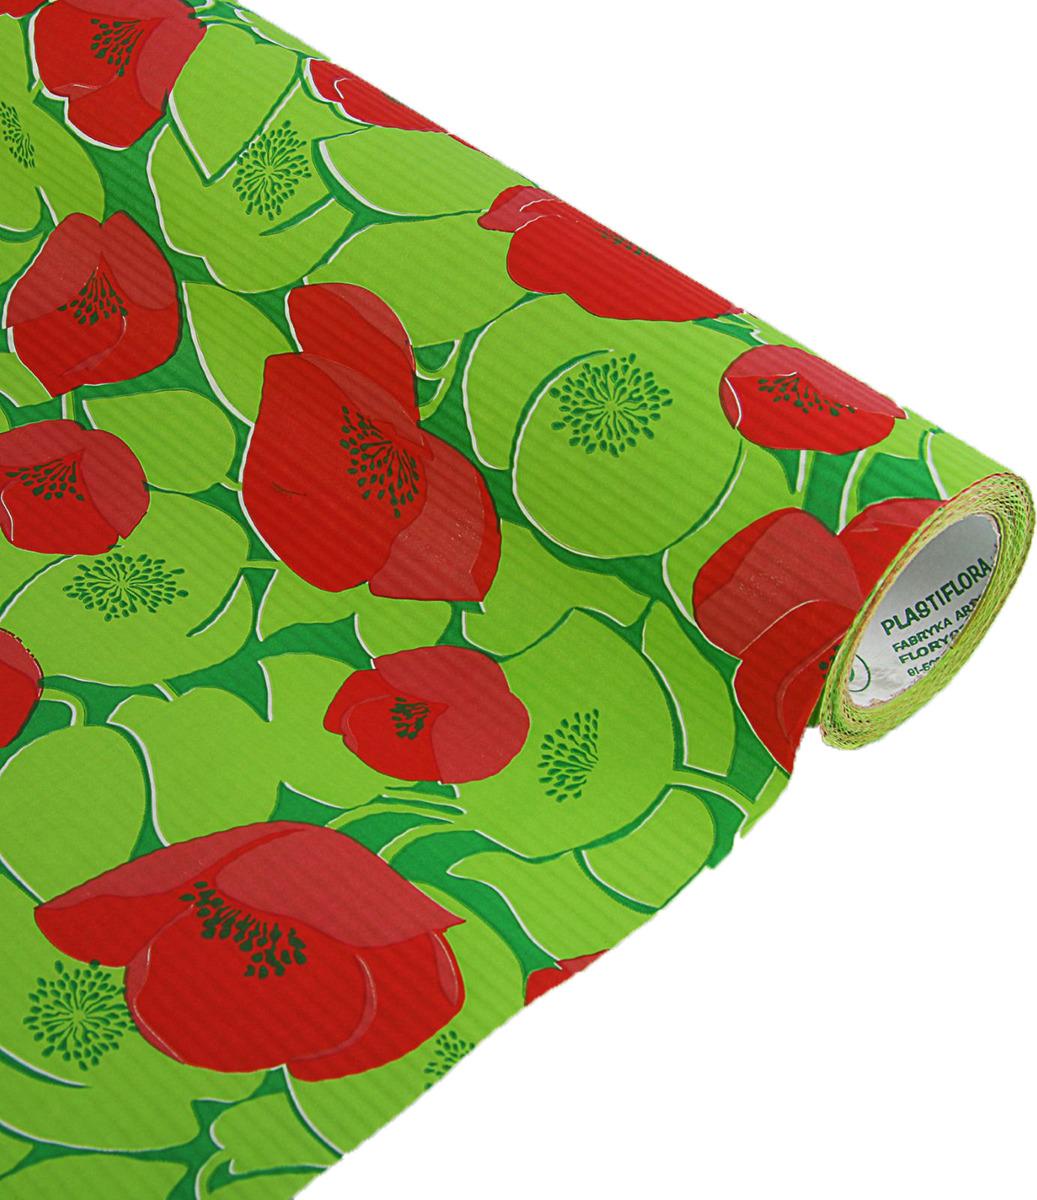 Бумага упаковочная Маки, 2321425, зеленый, красный, 0,5 х 10 м